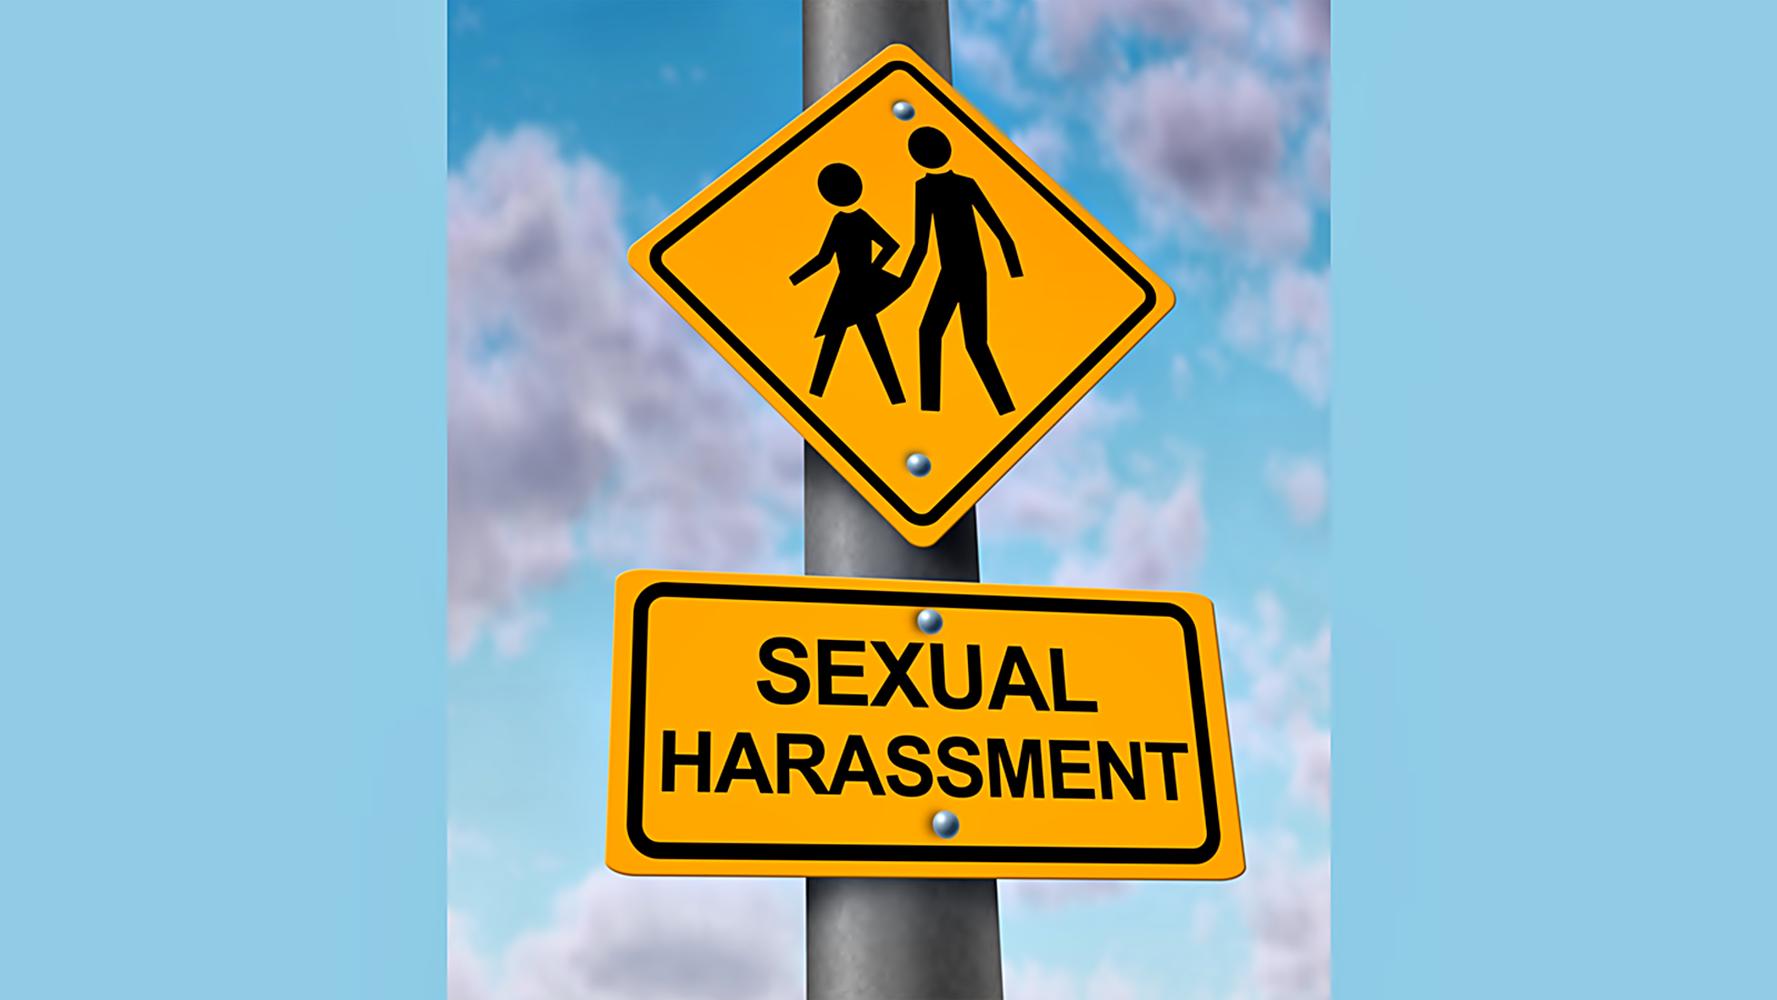 Verdi Sexuelle Belästigung Stoppen